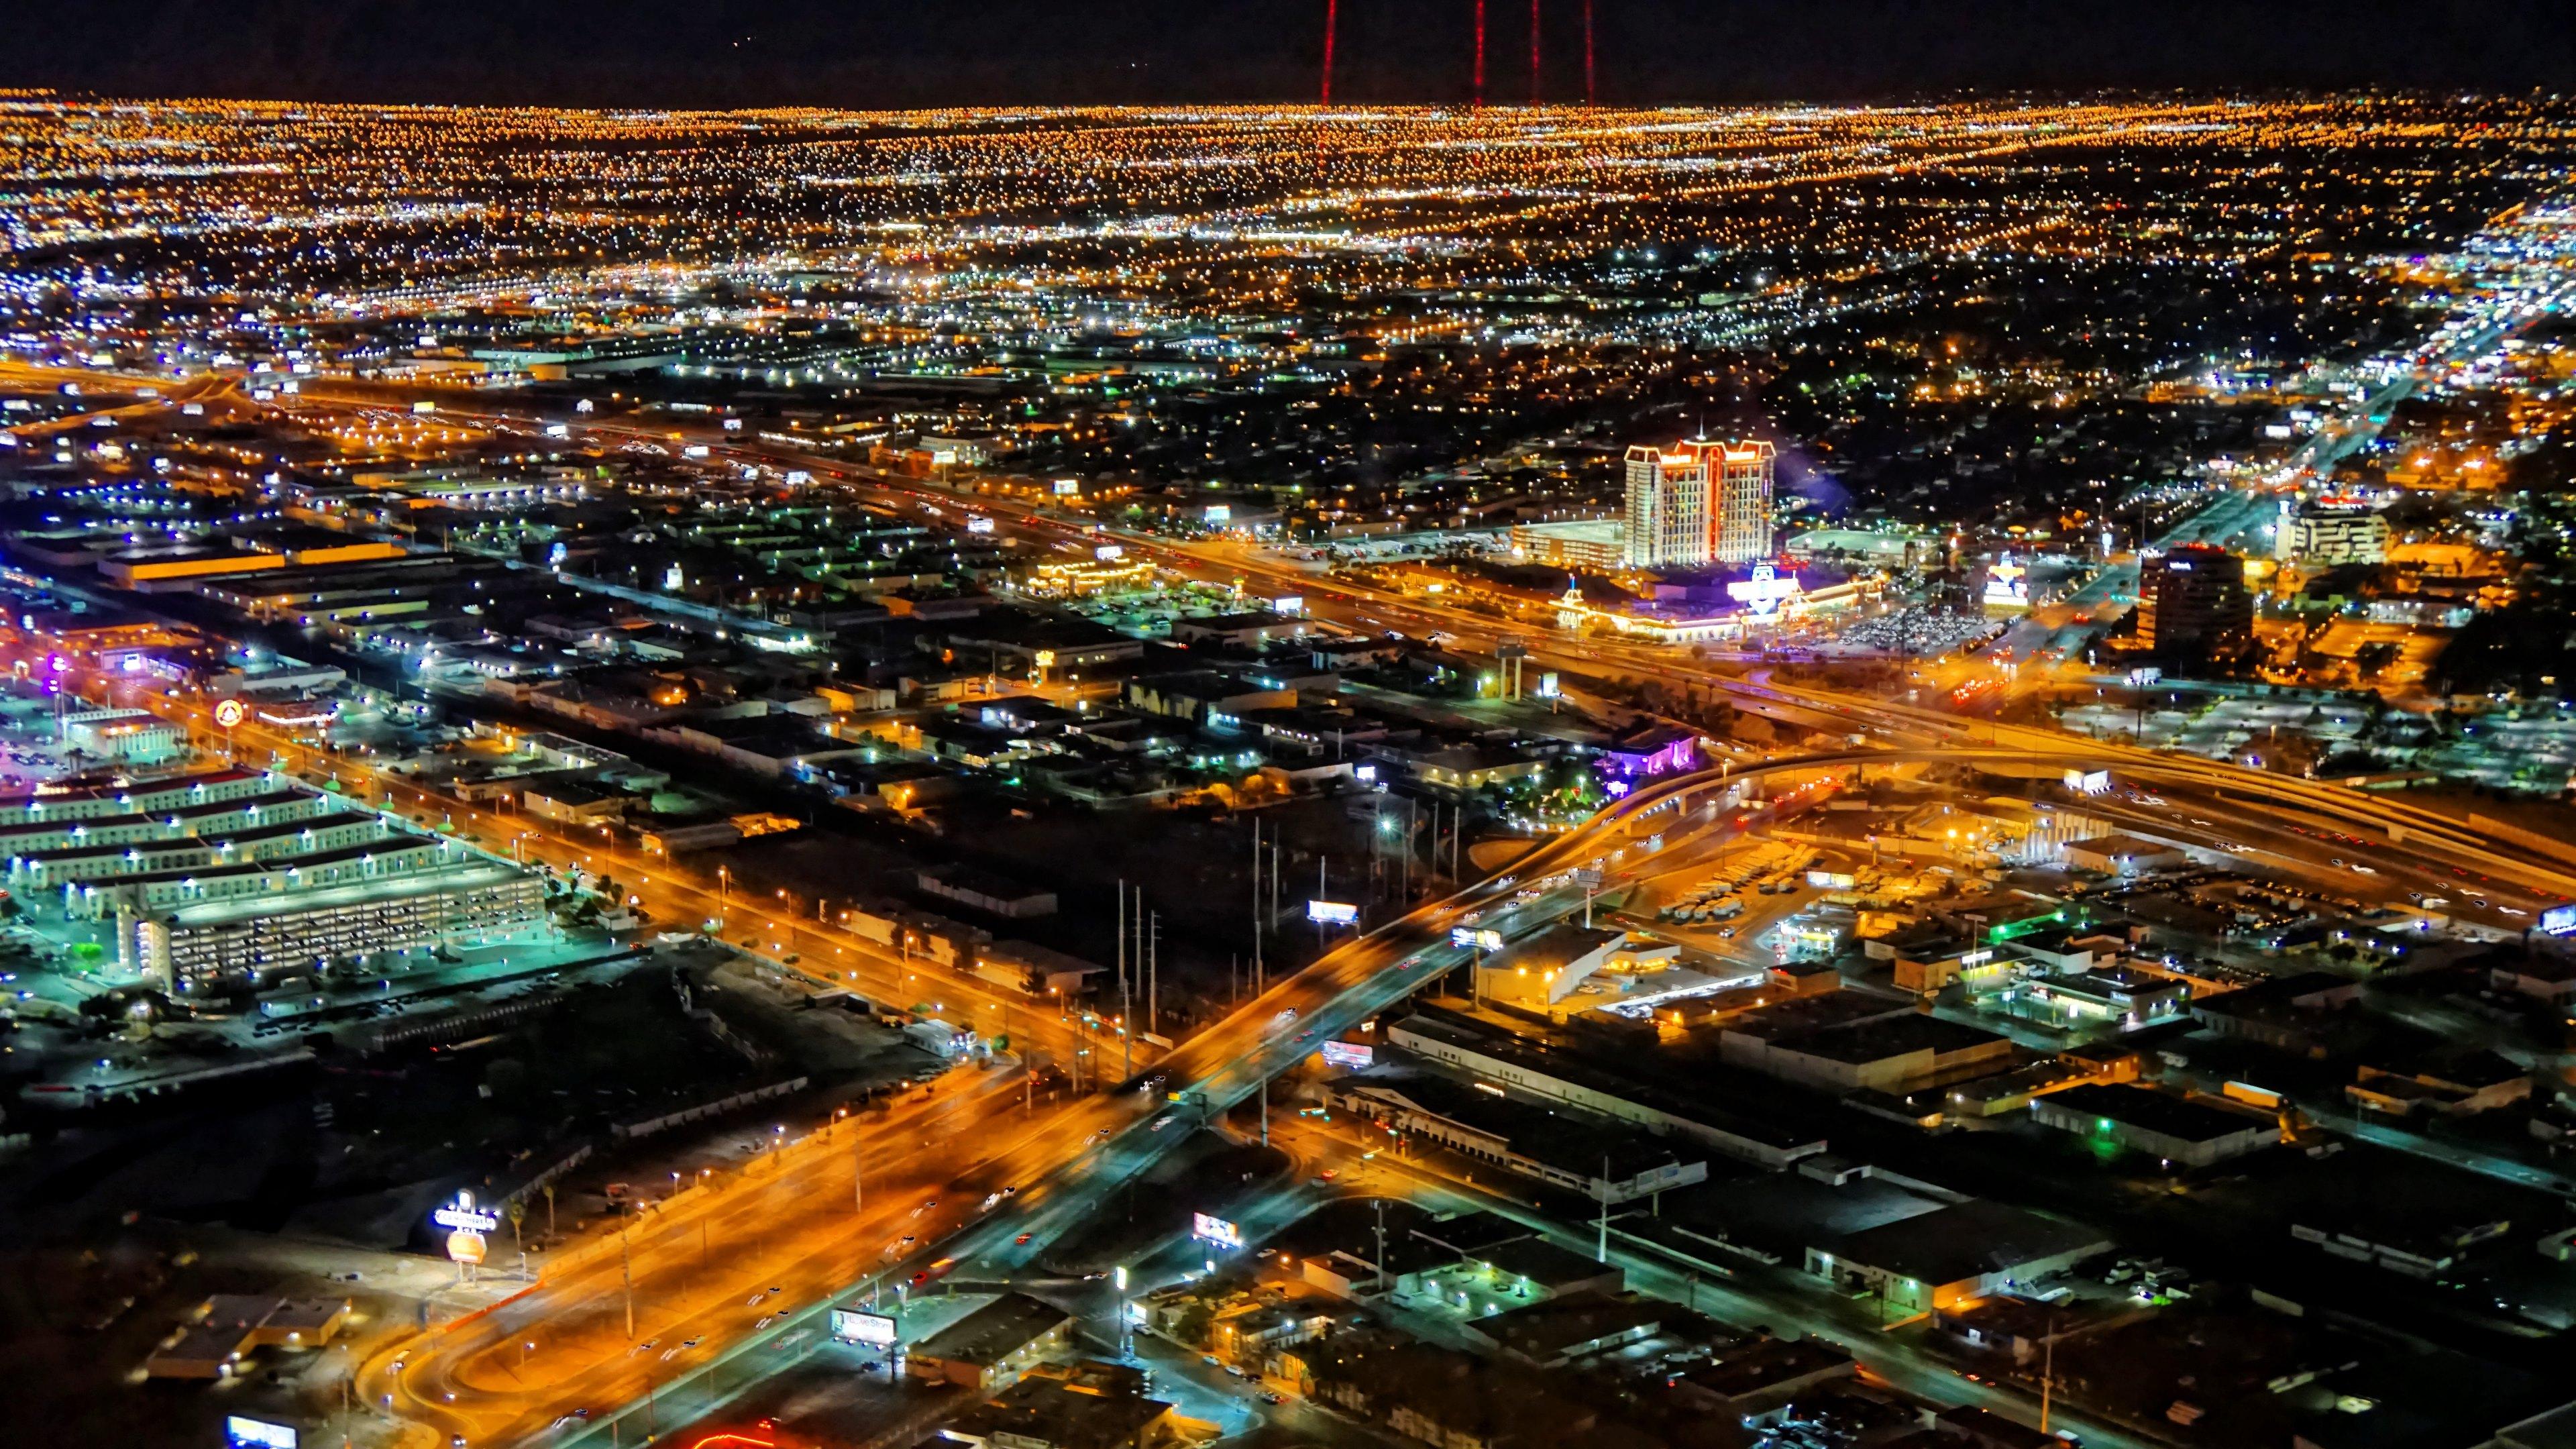 Las Vegas Night View Hd Wallpaper Hd Wallpaper